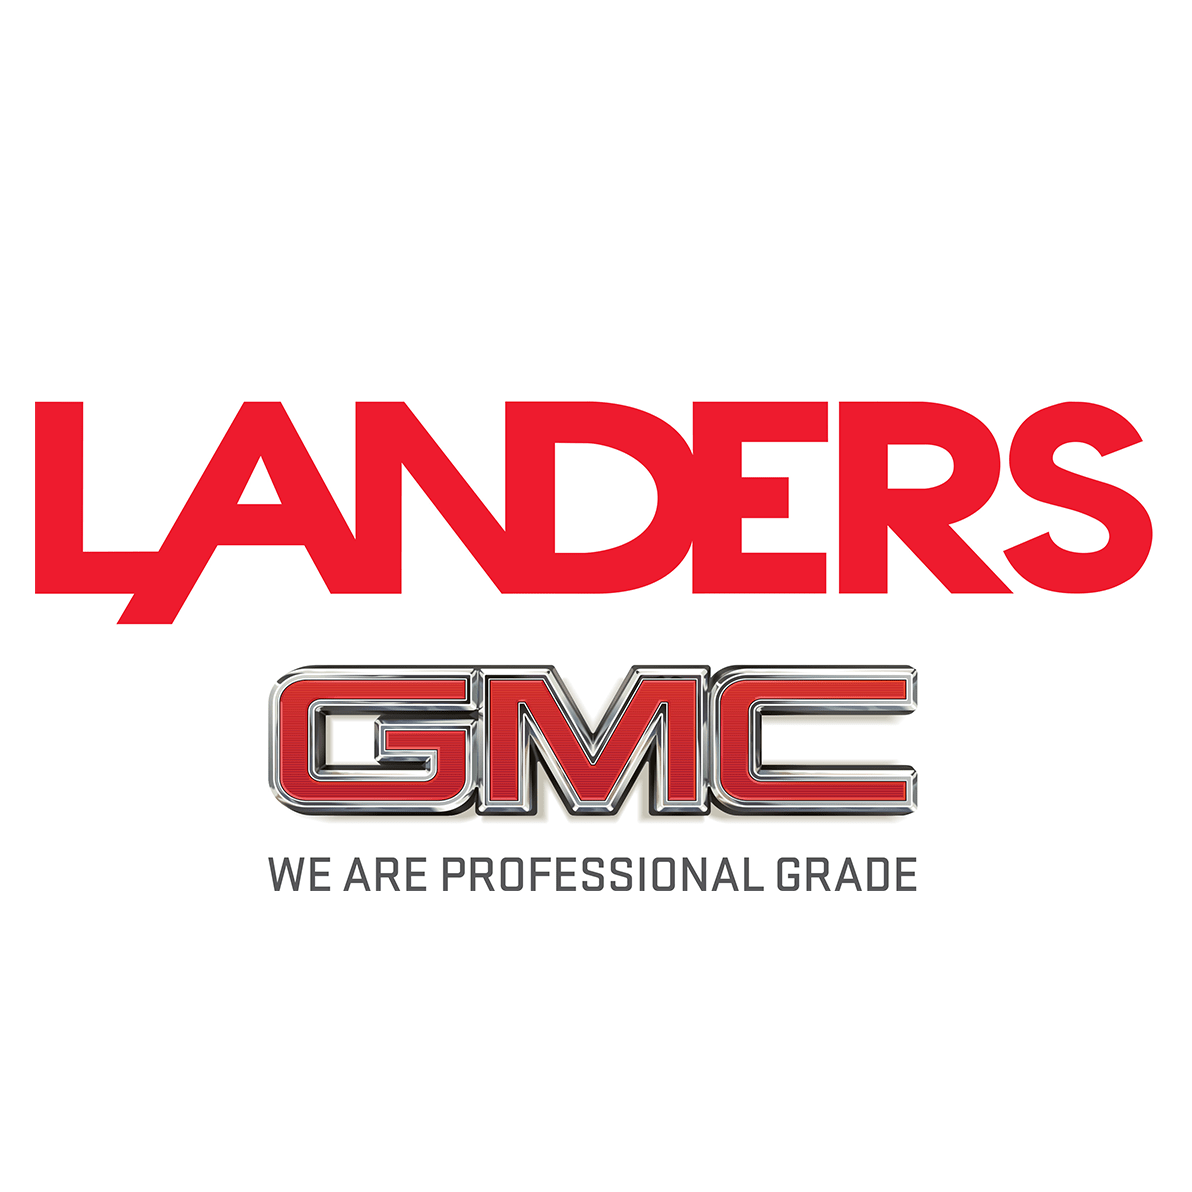 Landers GMC